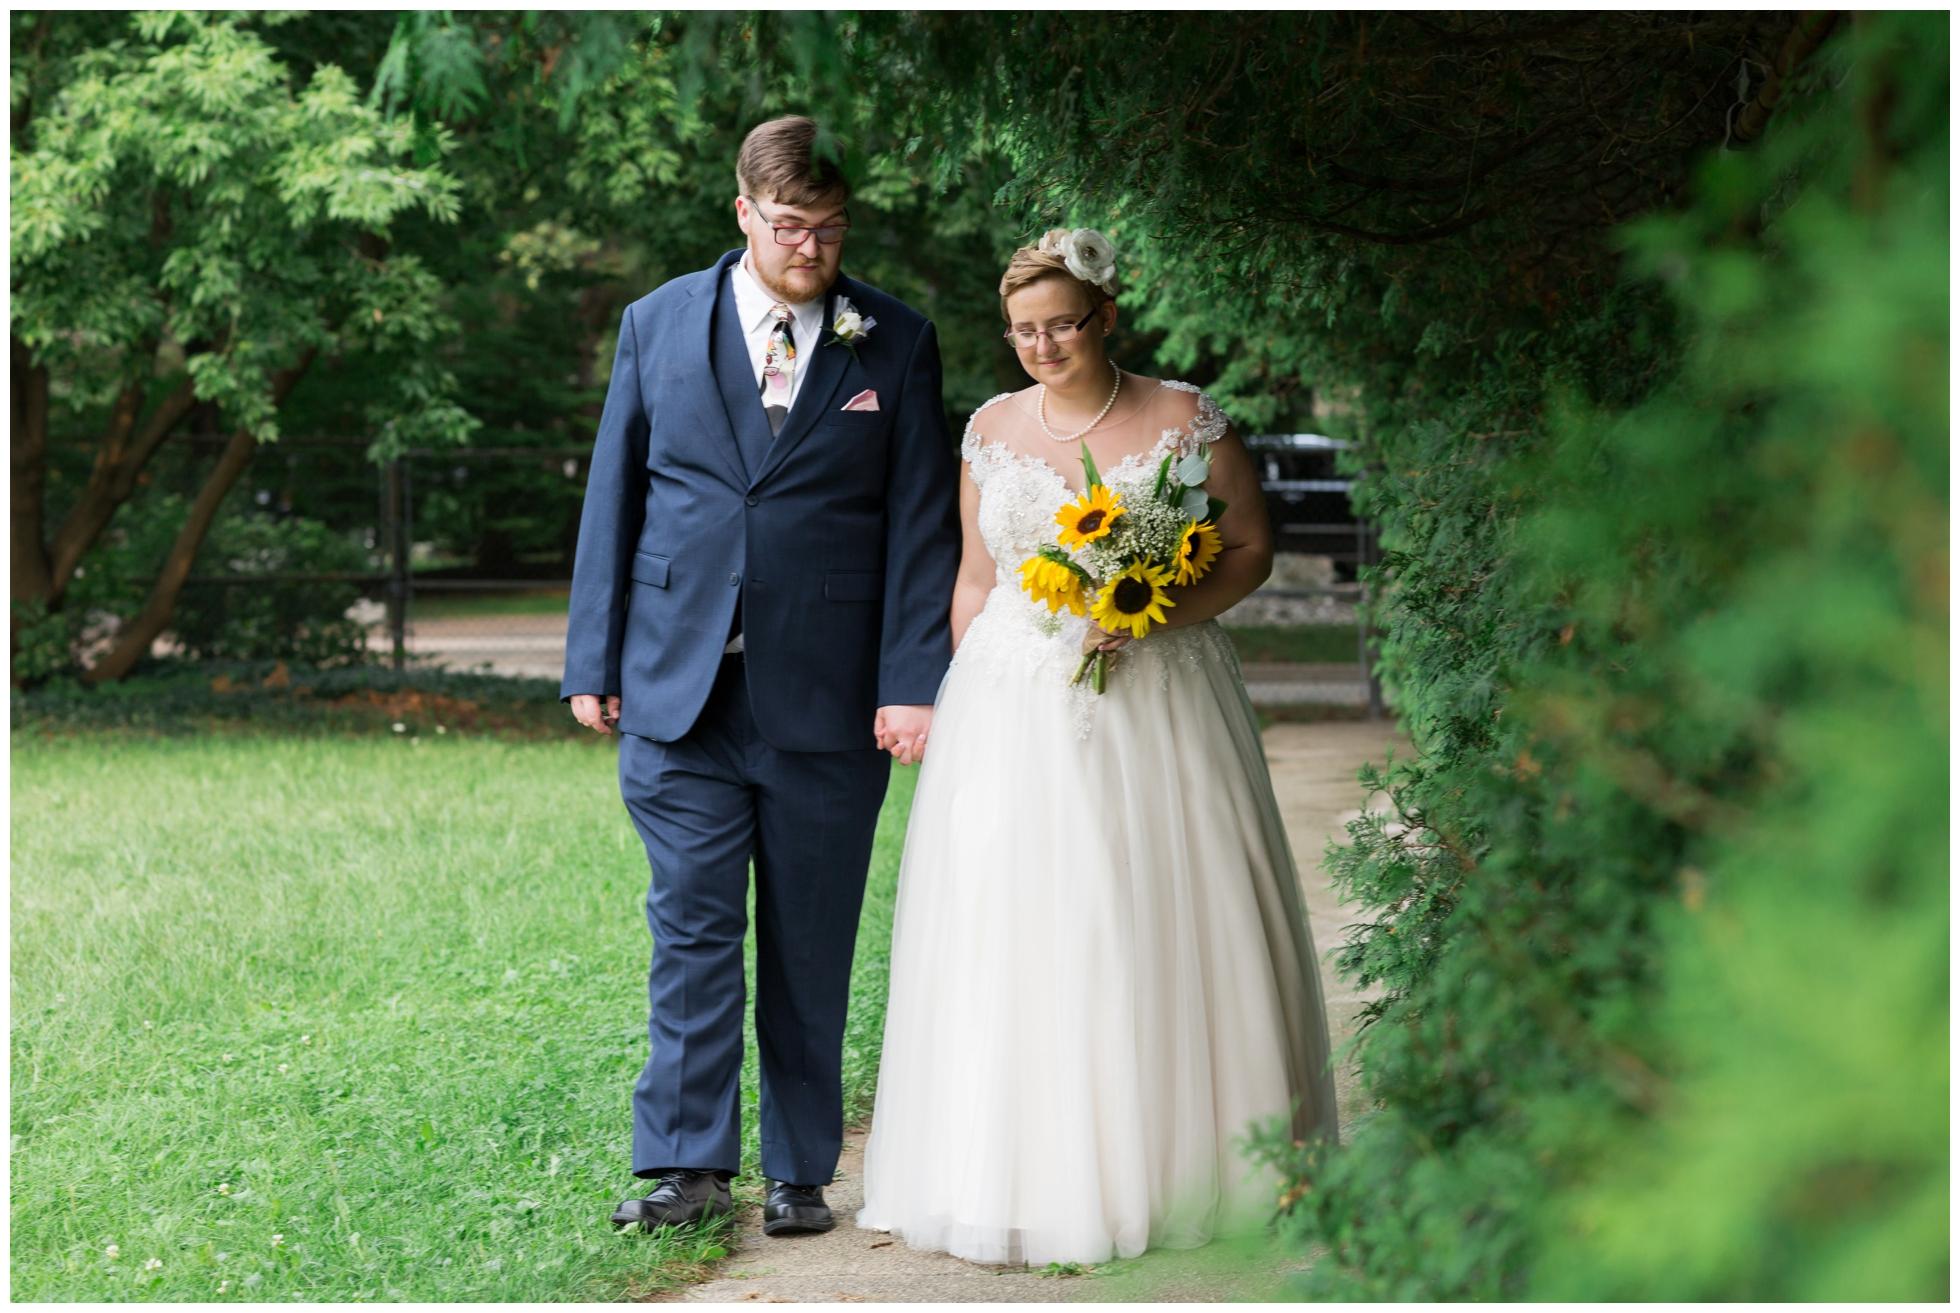 Toronto Wedding Chris Kate (Selena Phillips-Boyle)_0026.jpg